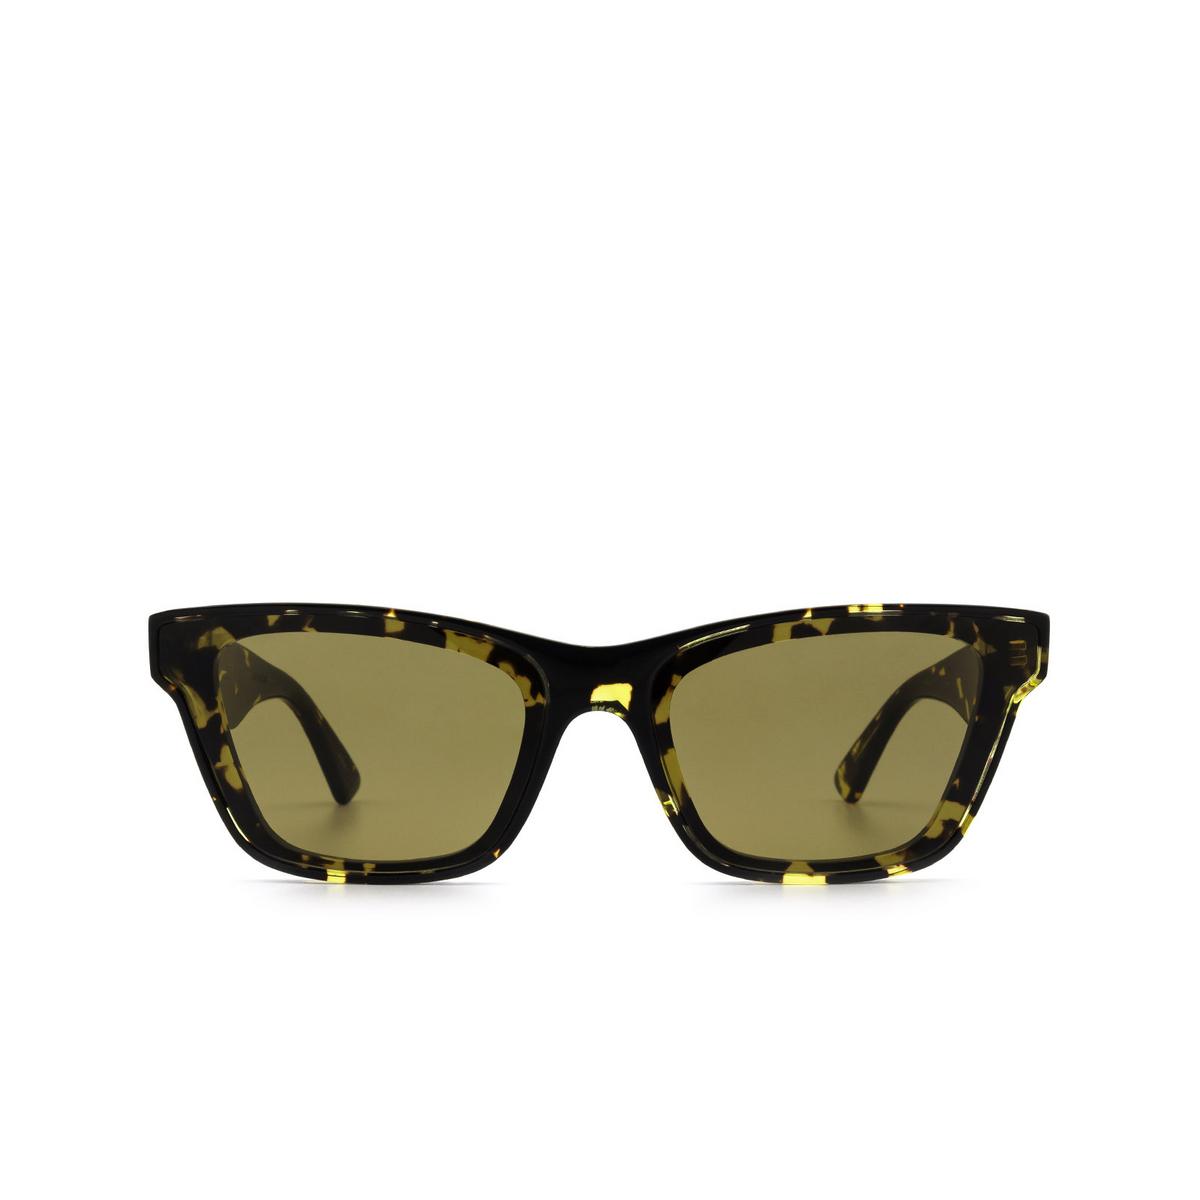 Bottega Veneta® Cat-eye Sunglasses: BV1119S color Havana 002 - front view.